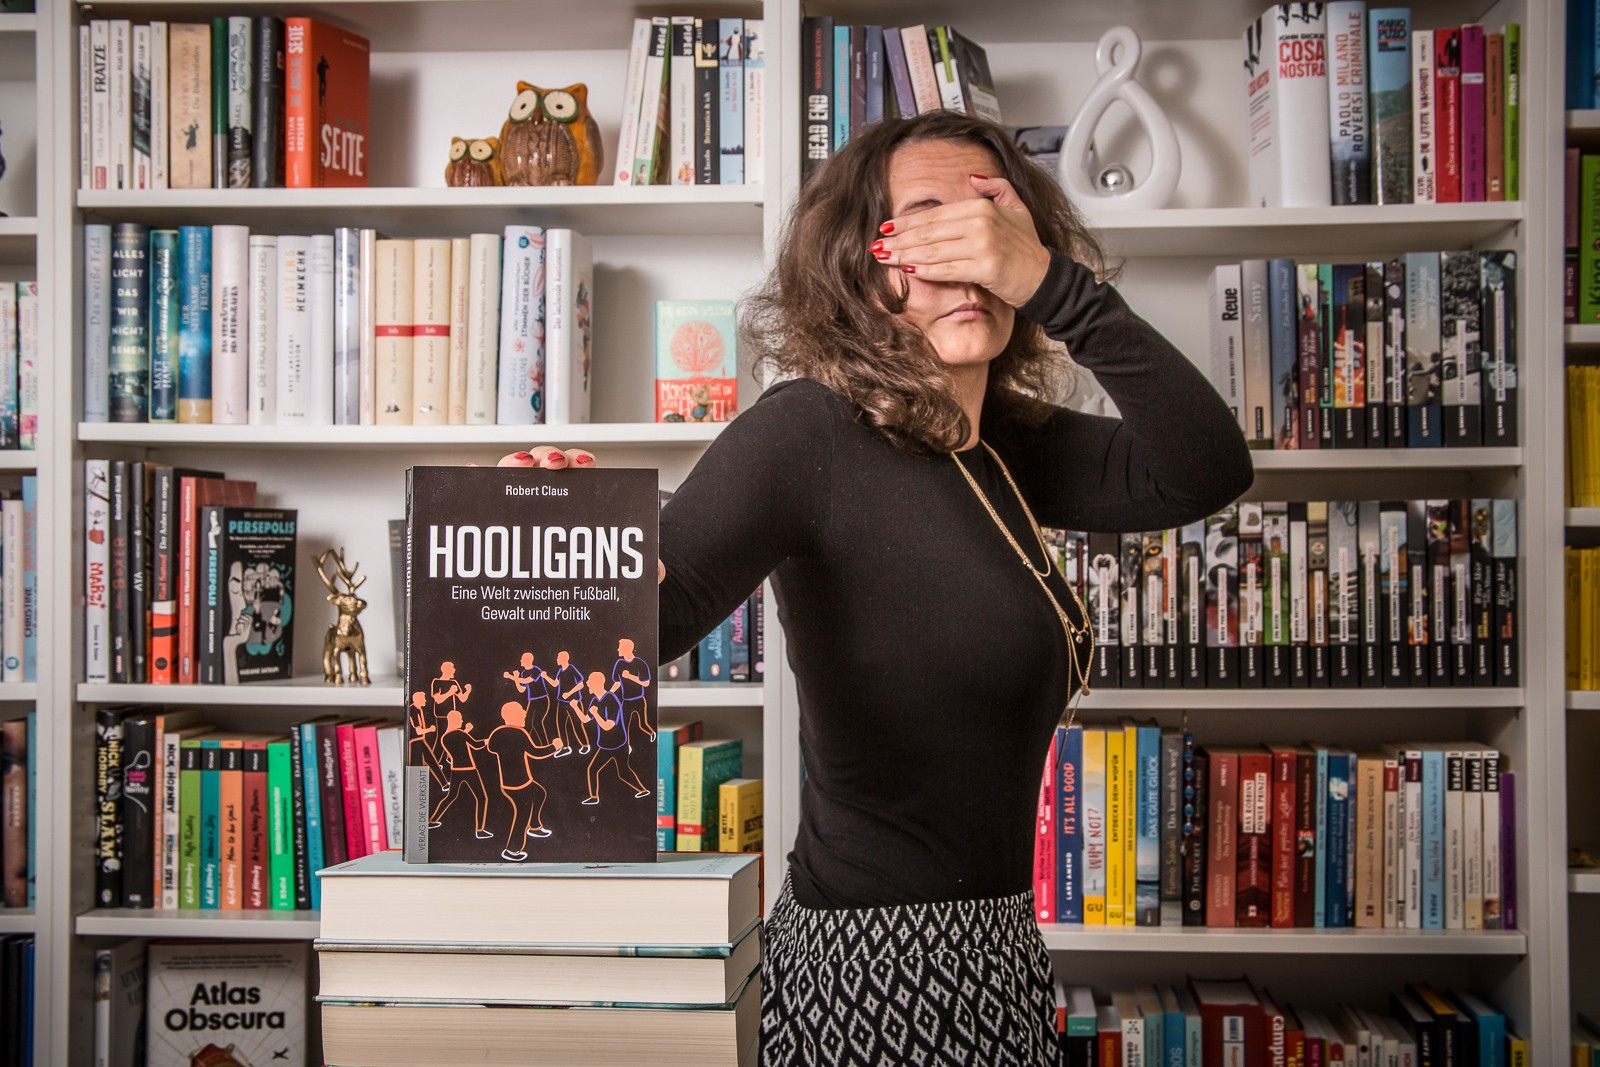 Hooligans - Robert Claus